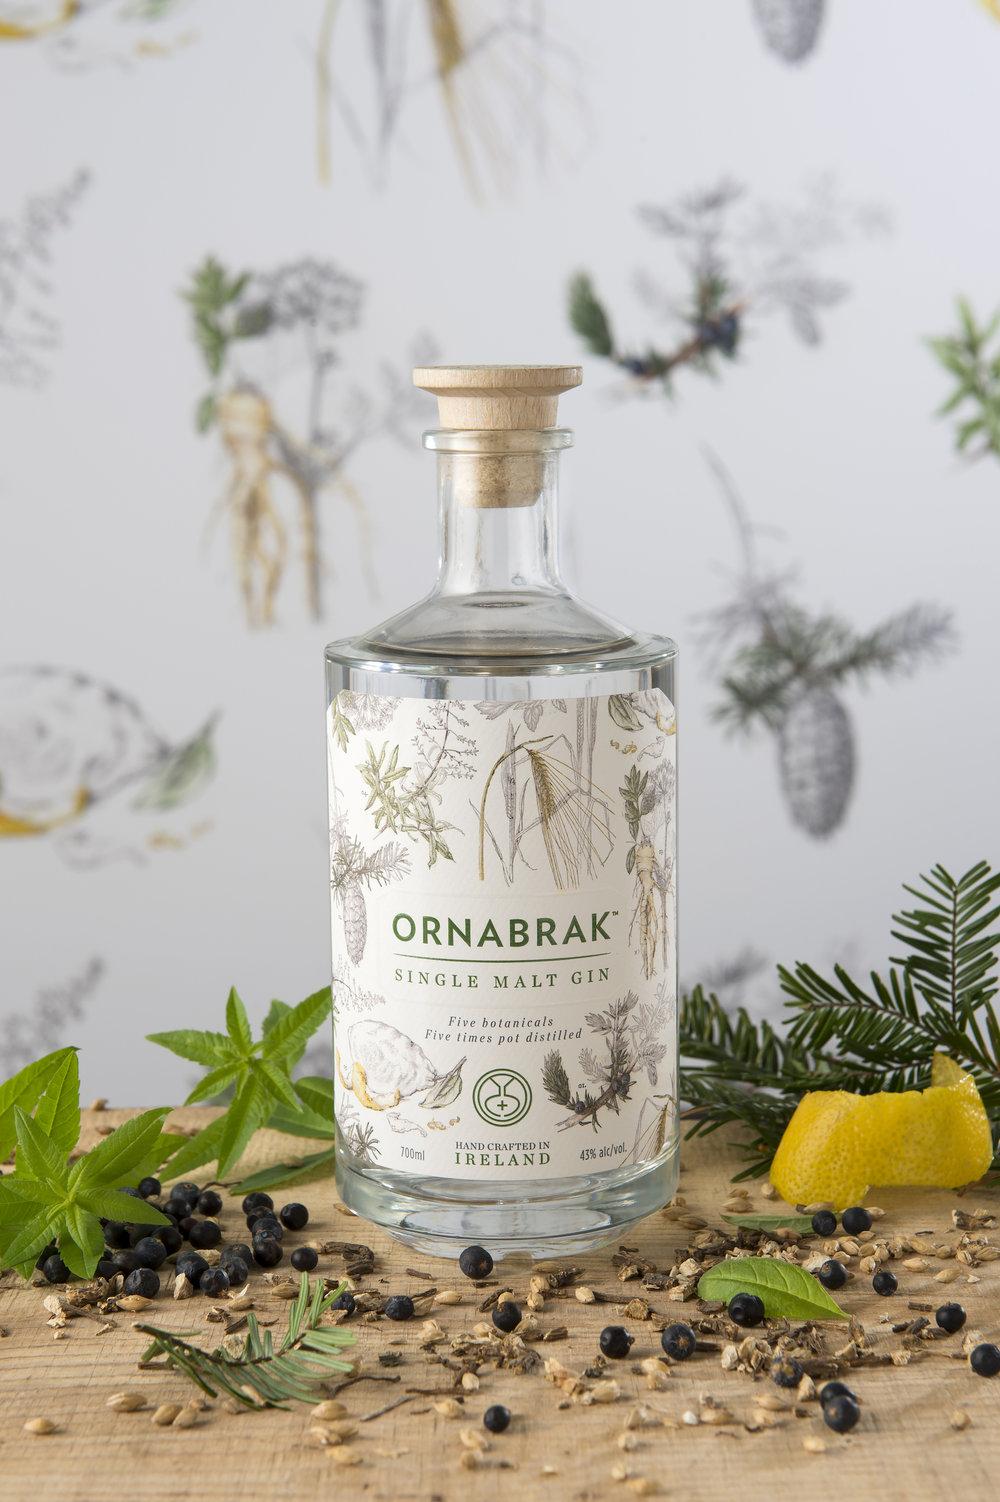 Ornabrak_Single_Malt_Gin_botanical_backdrop_and_fresh_botanicals.jpg